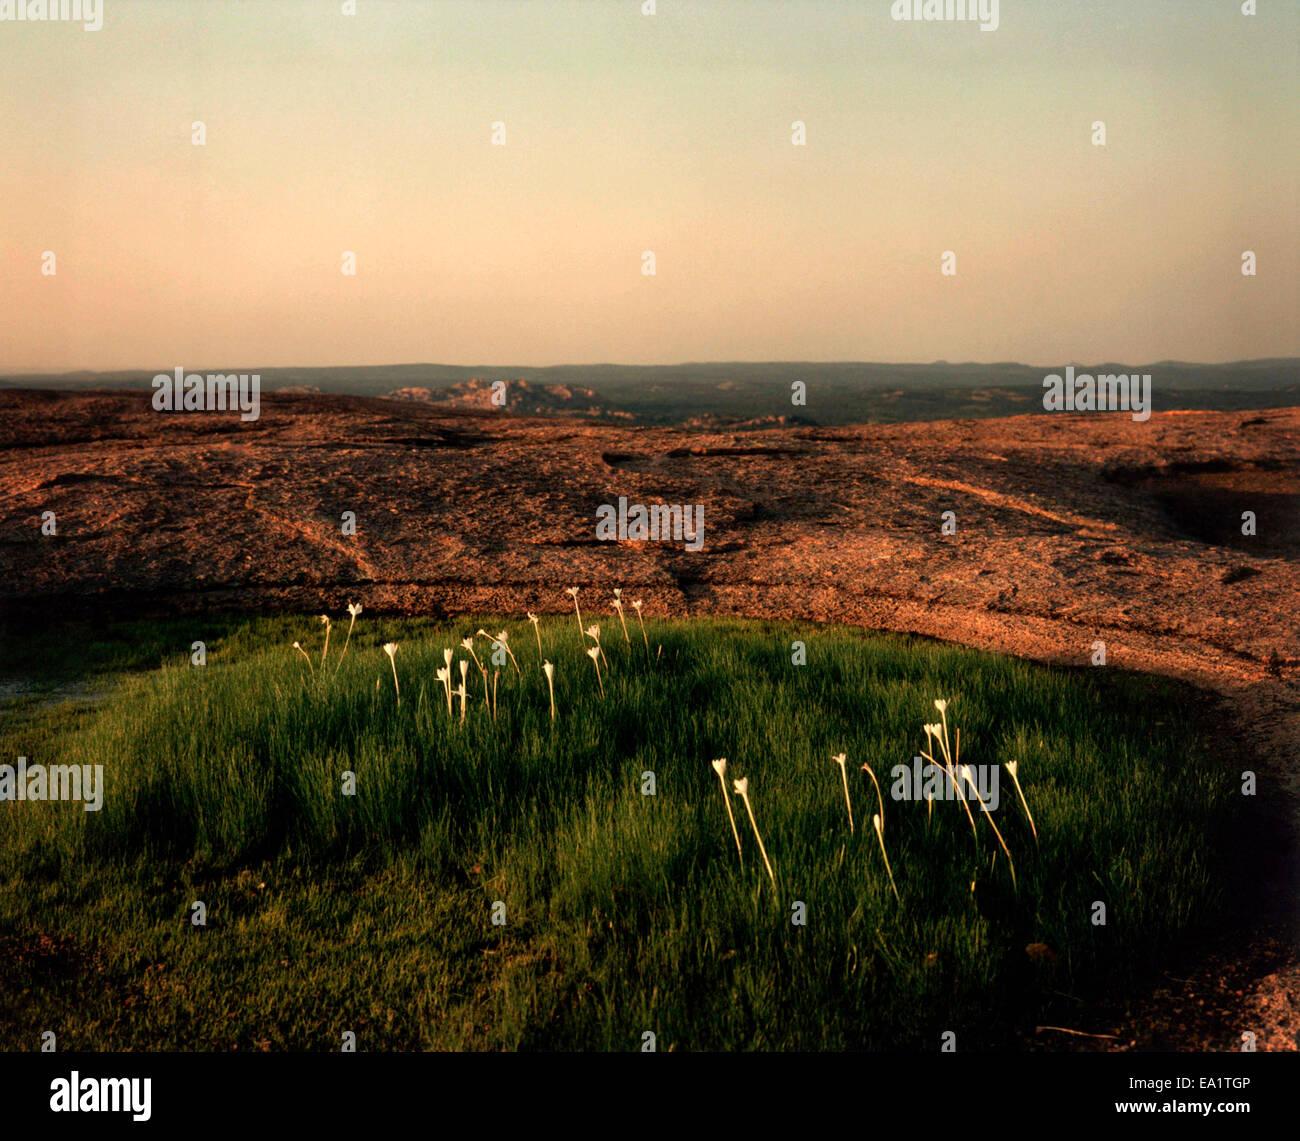 The Summitt of Enchanted Rock, Fredericksburg, Texas - Stock Image